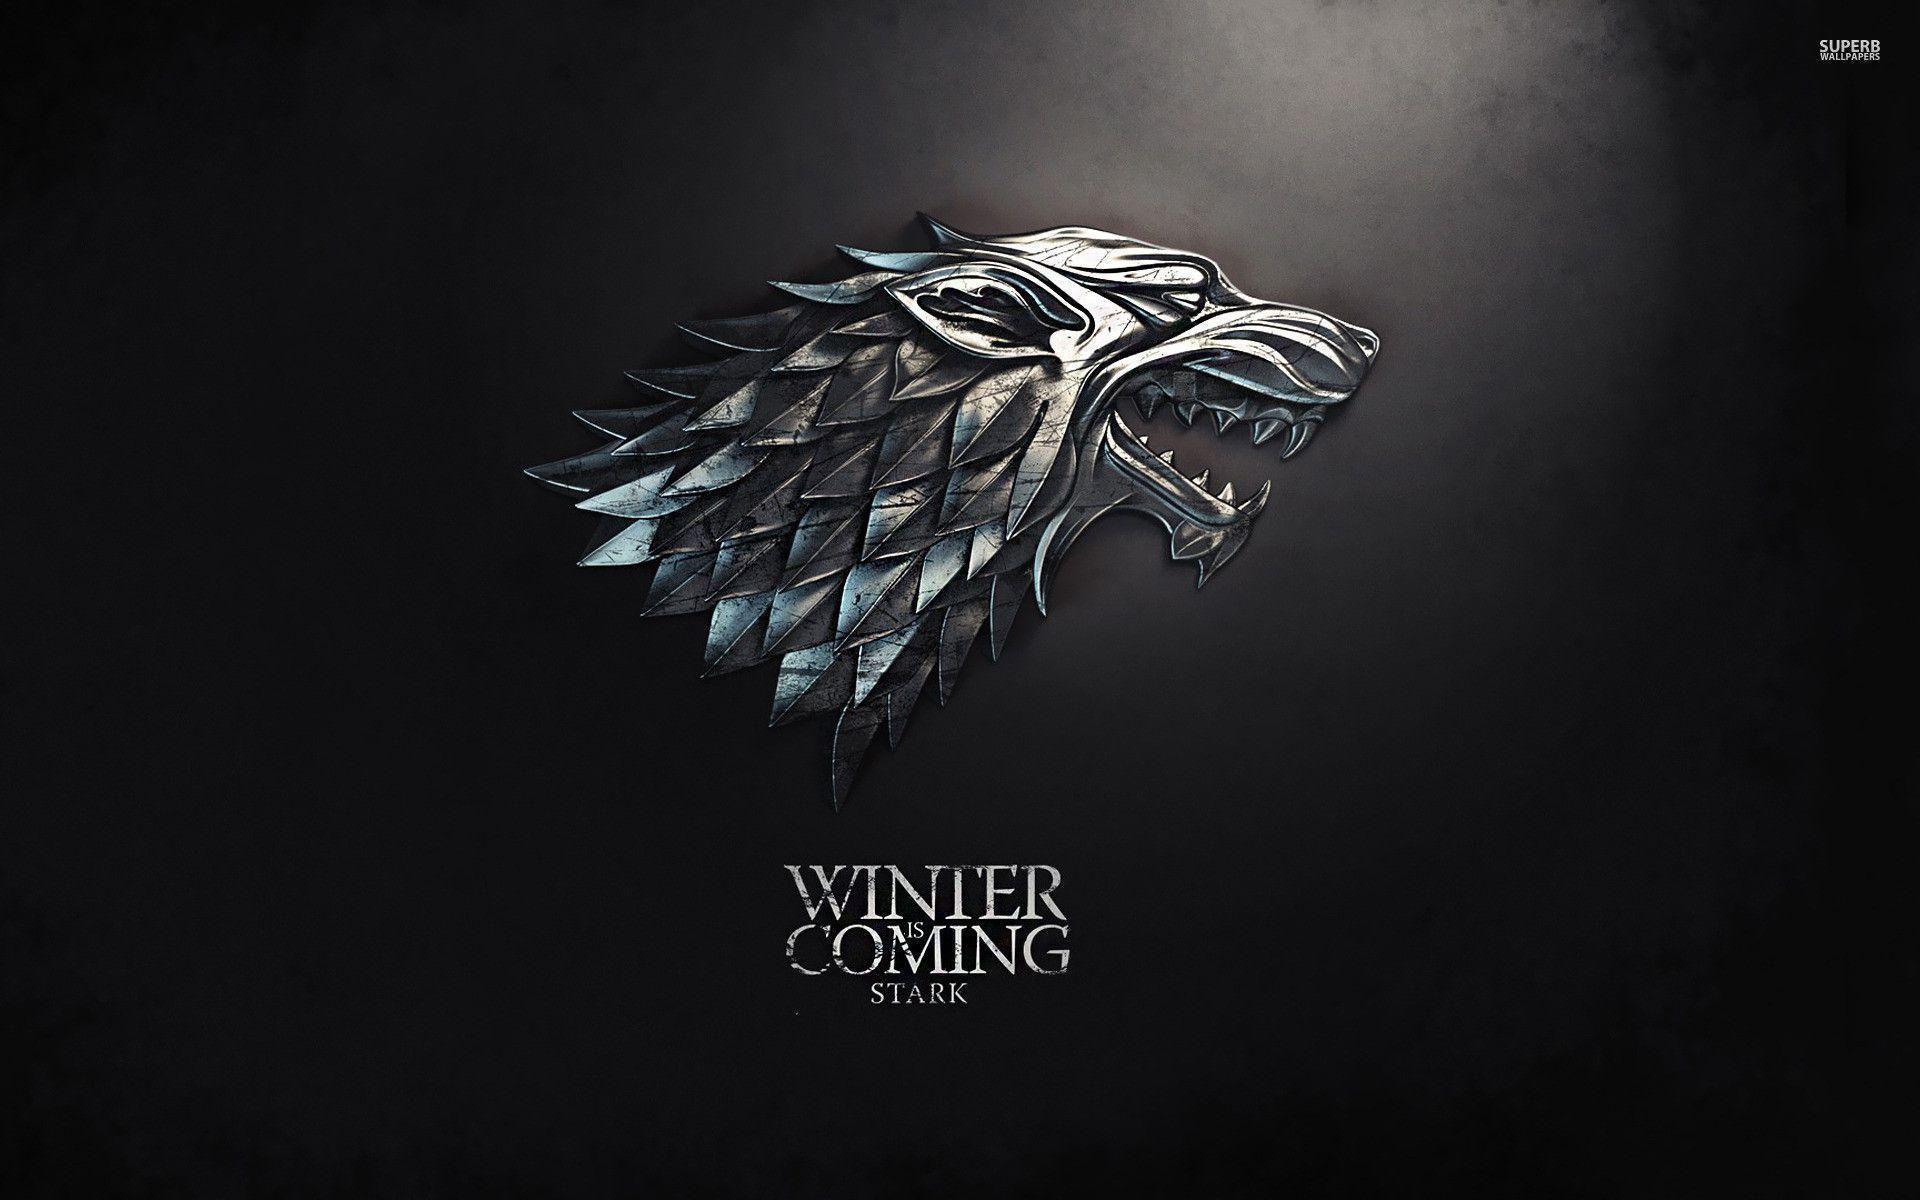 Game Of Thrones Winter Is Here Wallpapers Top Free Game Of Thrones Winter Is Here Backgroun Winter Is Coming Wallpaper Game Of Thrones Houses Game Of Thrones